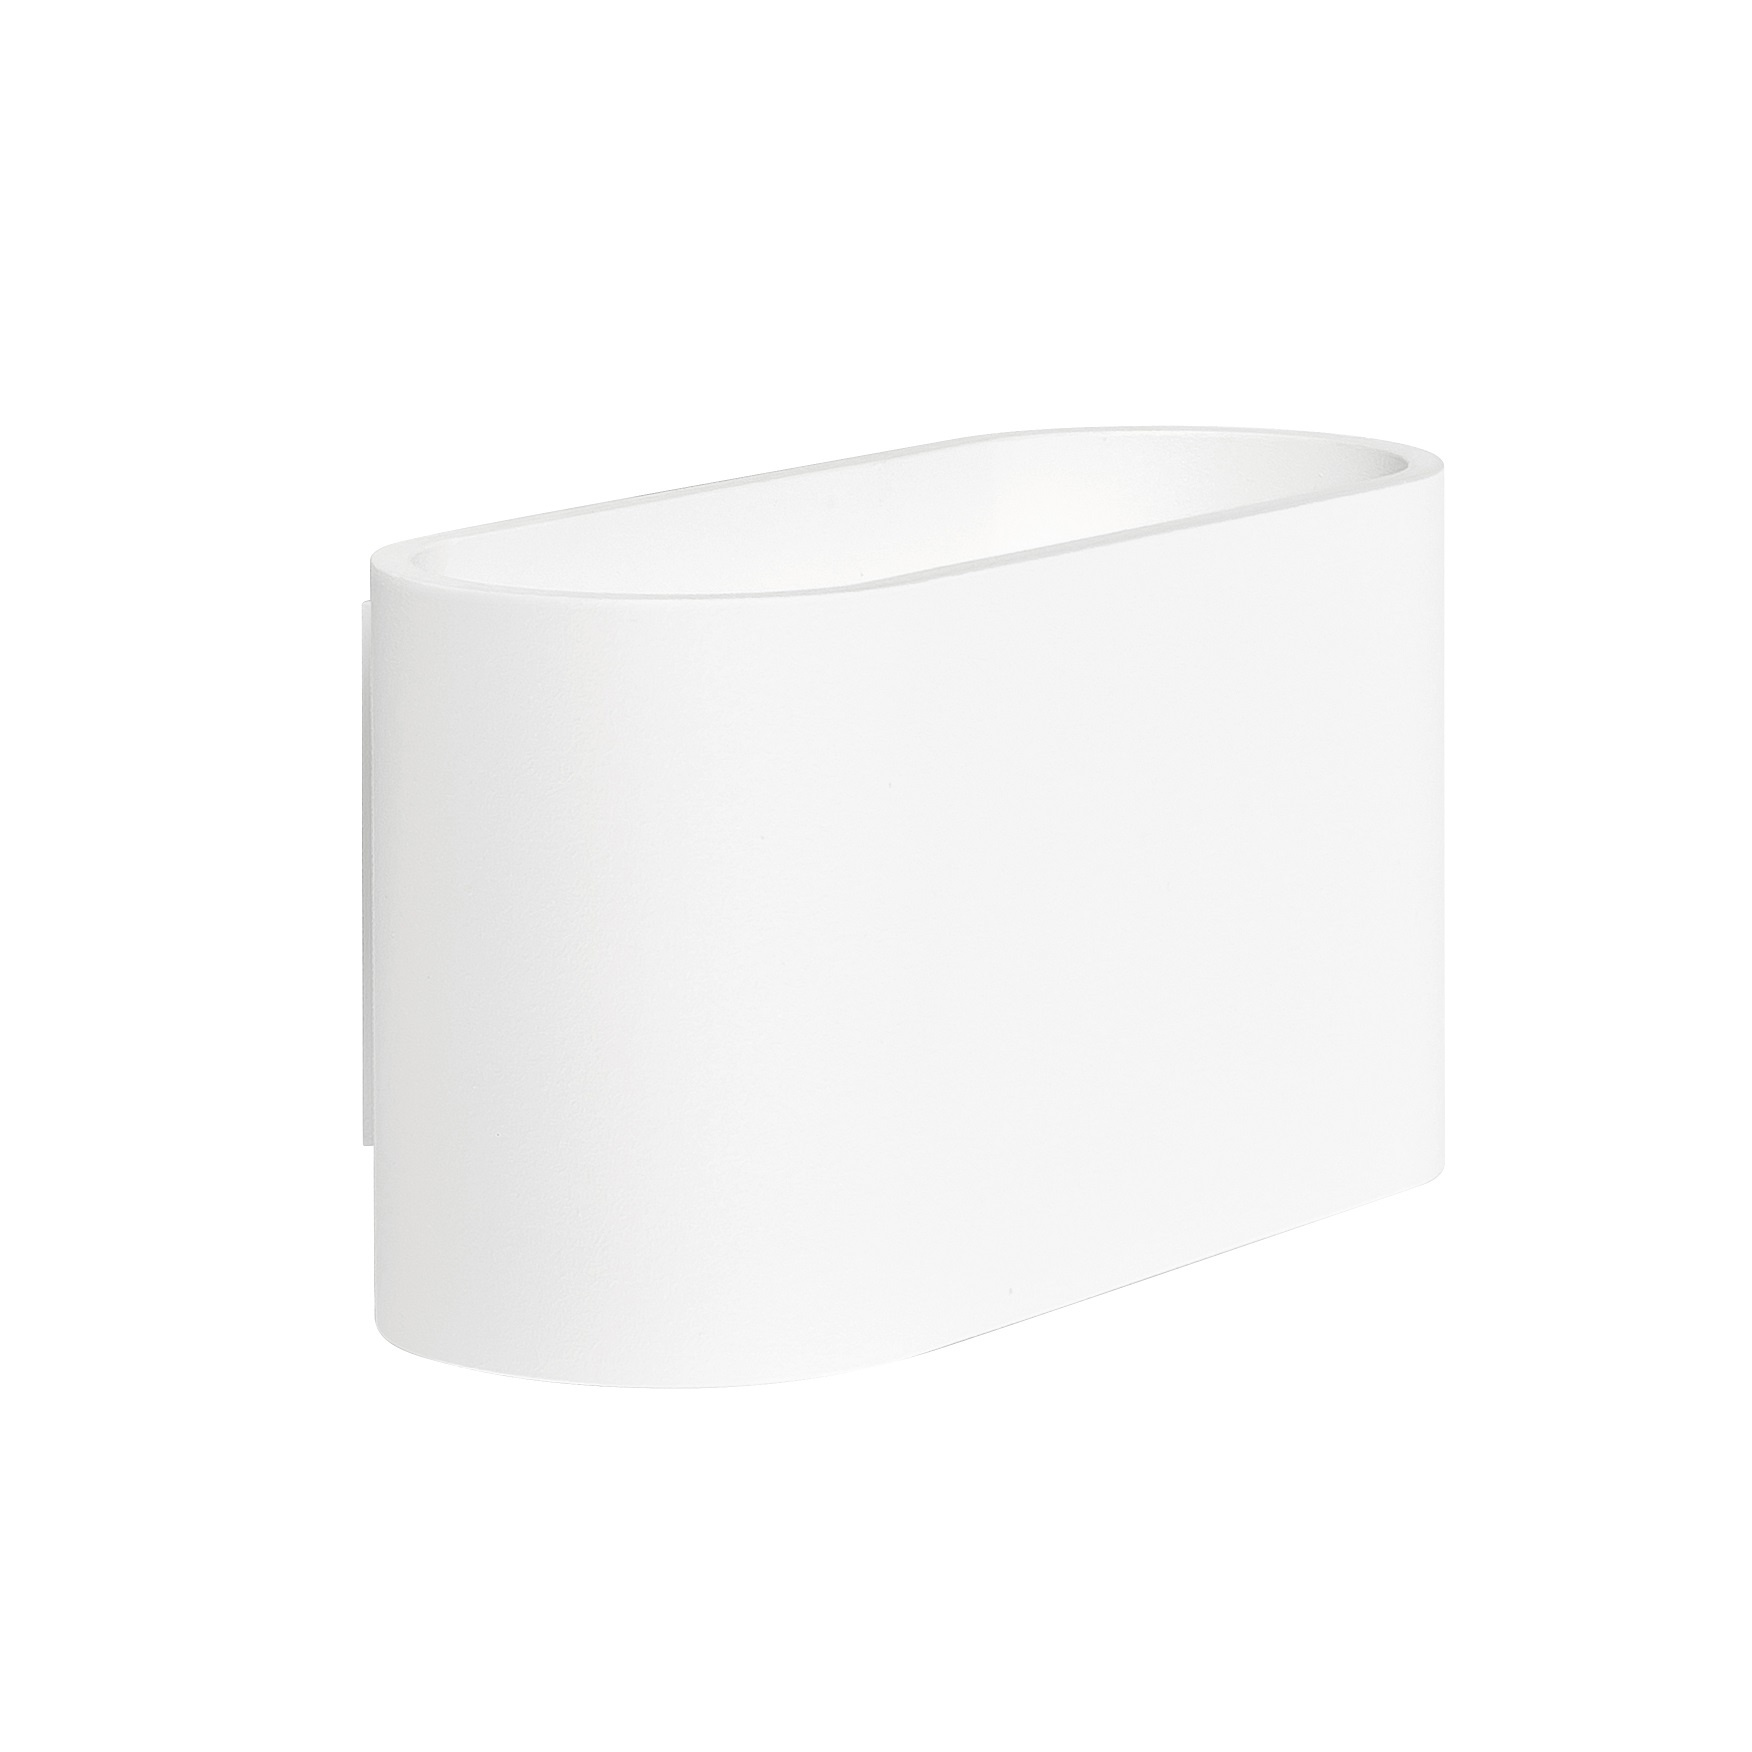 Wandlamp Oval Wit G9 16CM